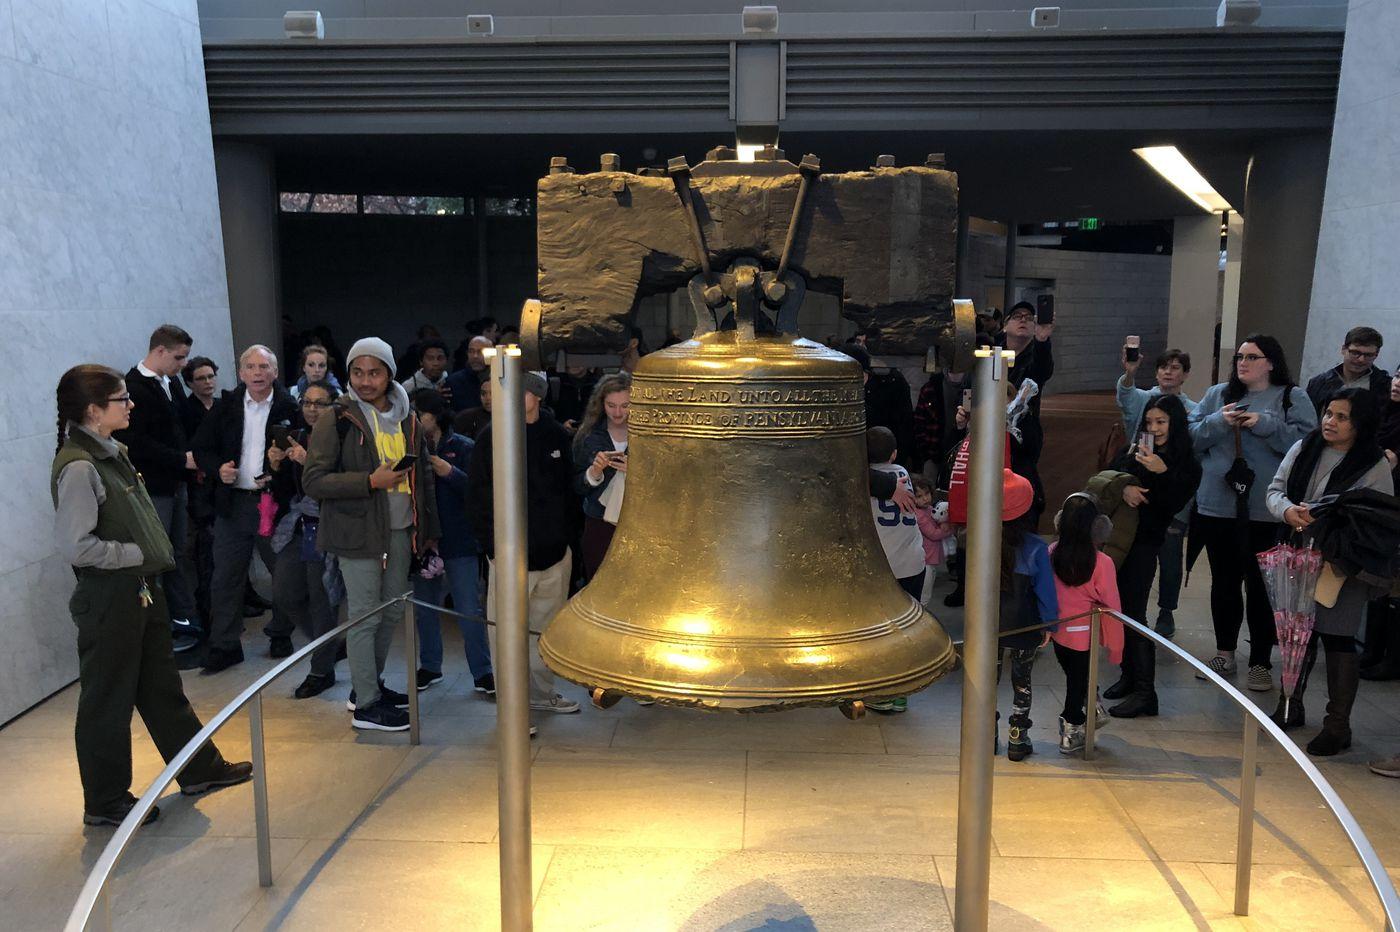 Does the Liberty Bell still represent Philadelphia? | Stu Bykofsky